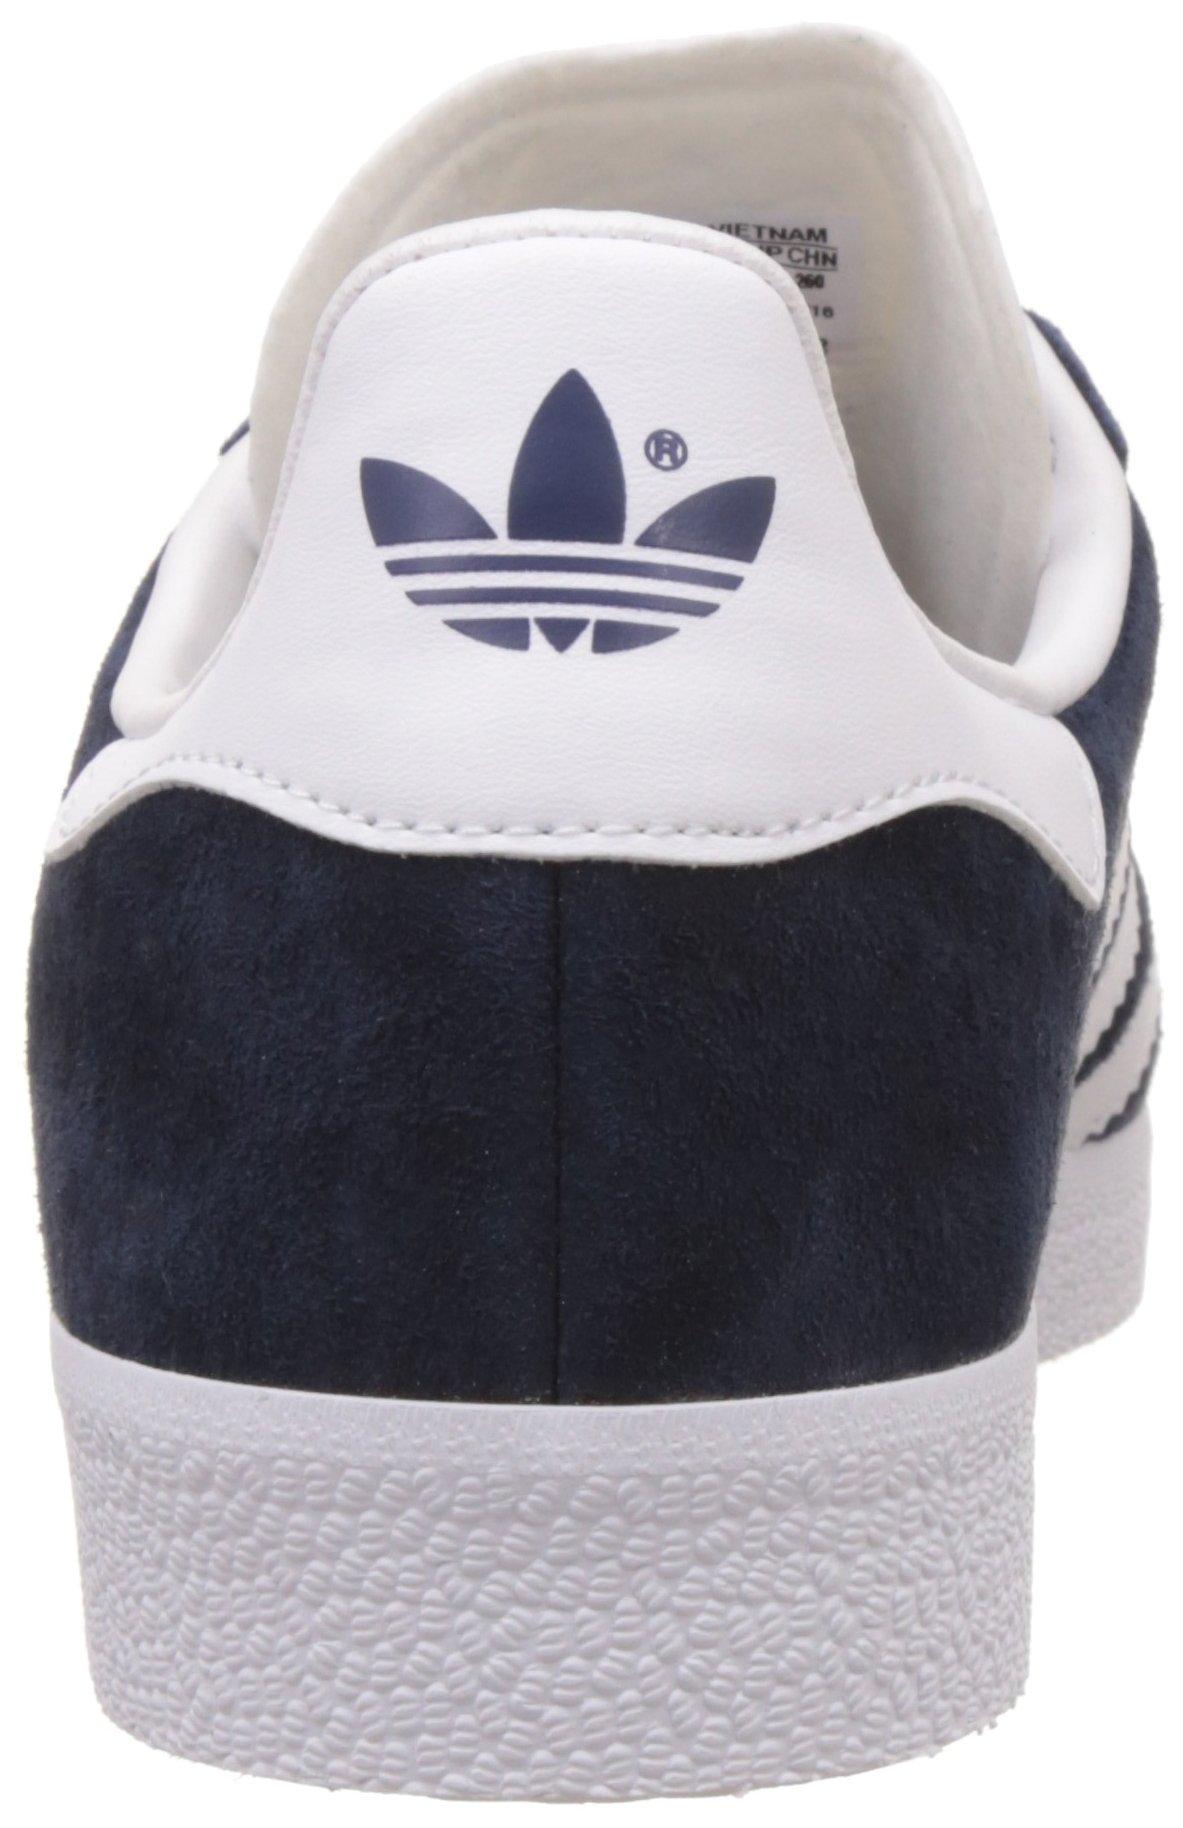 8a1938c035795 New Adidas Originals Nmd Men Velcro Wrestling Shoes